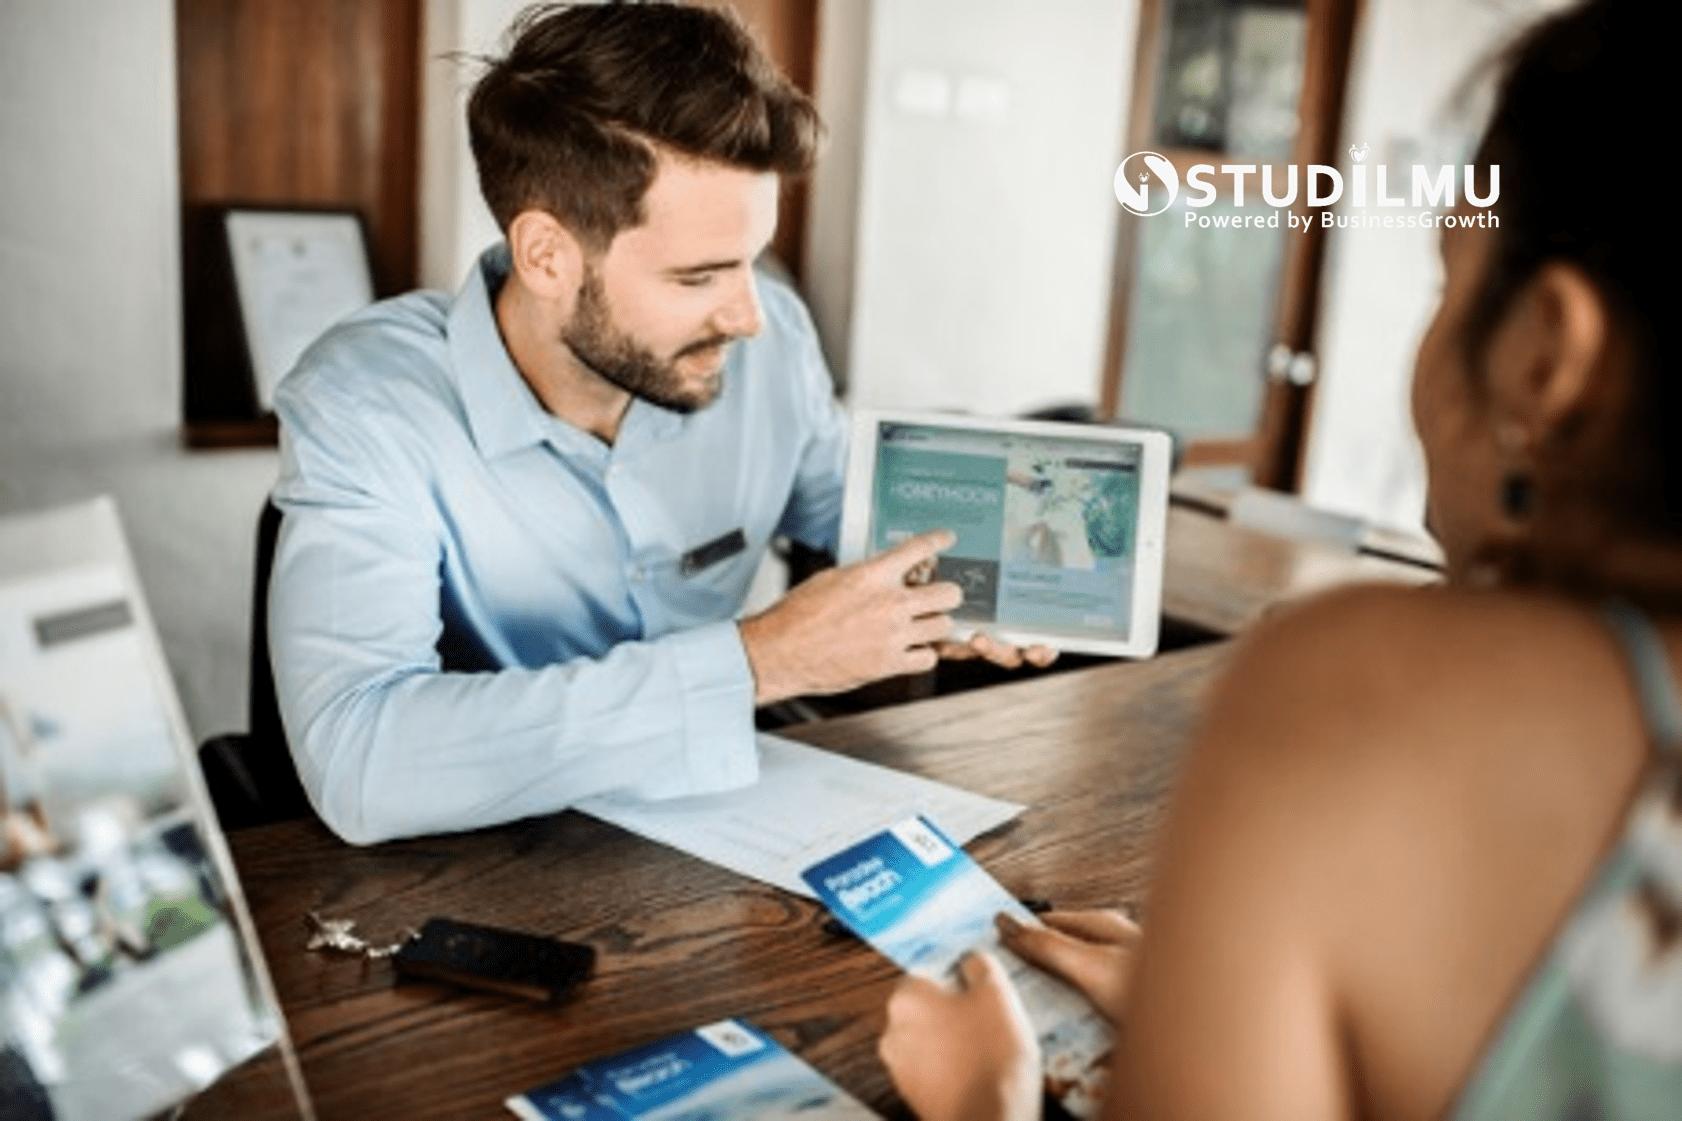 STUDILMU Career Advice - Ingin Pelanggan Tetap Setia? Coba 4 Strategi Ini!